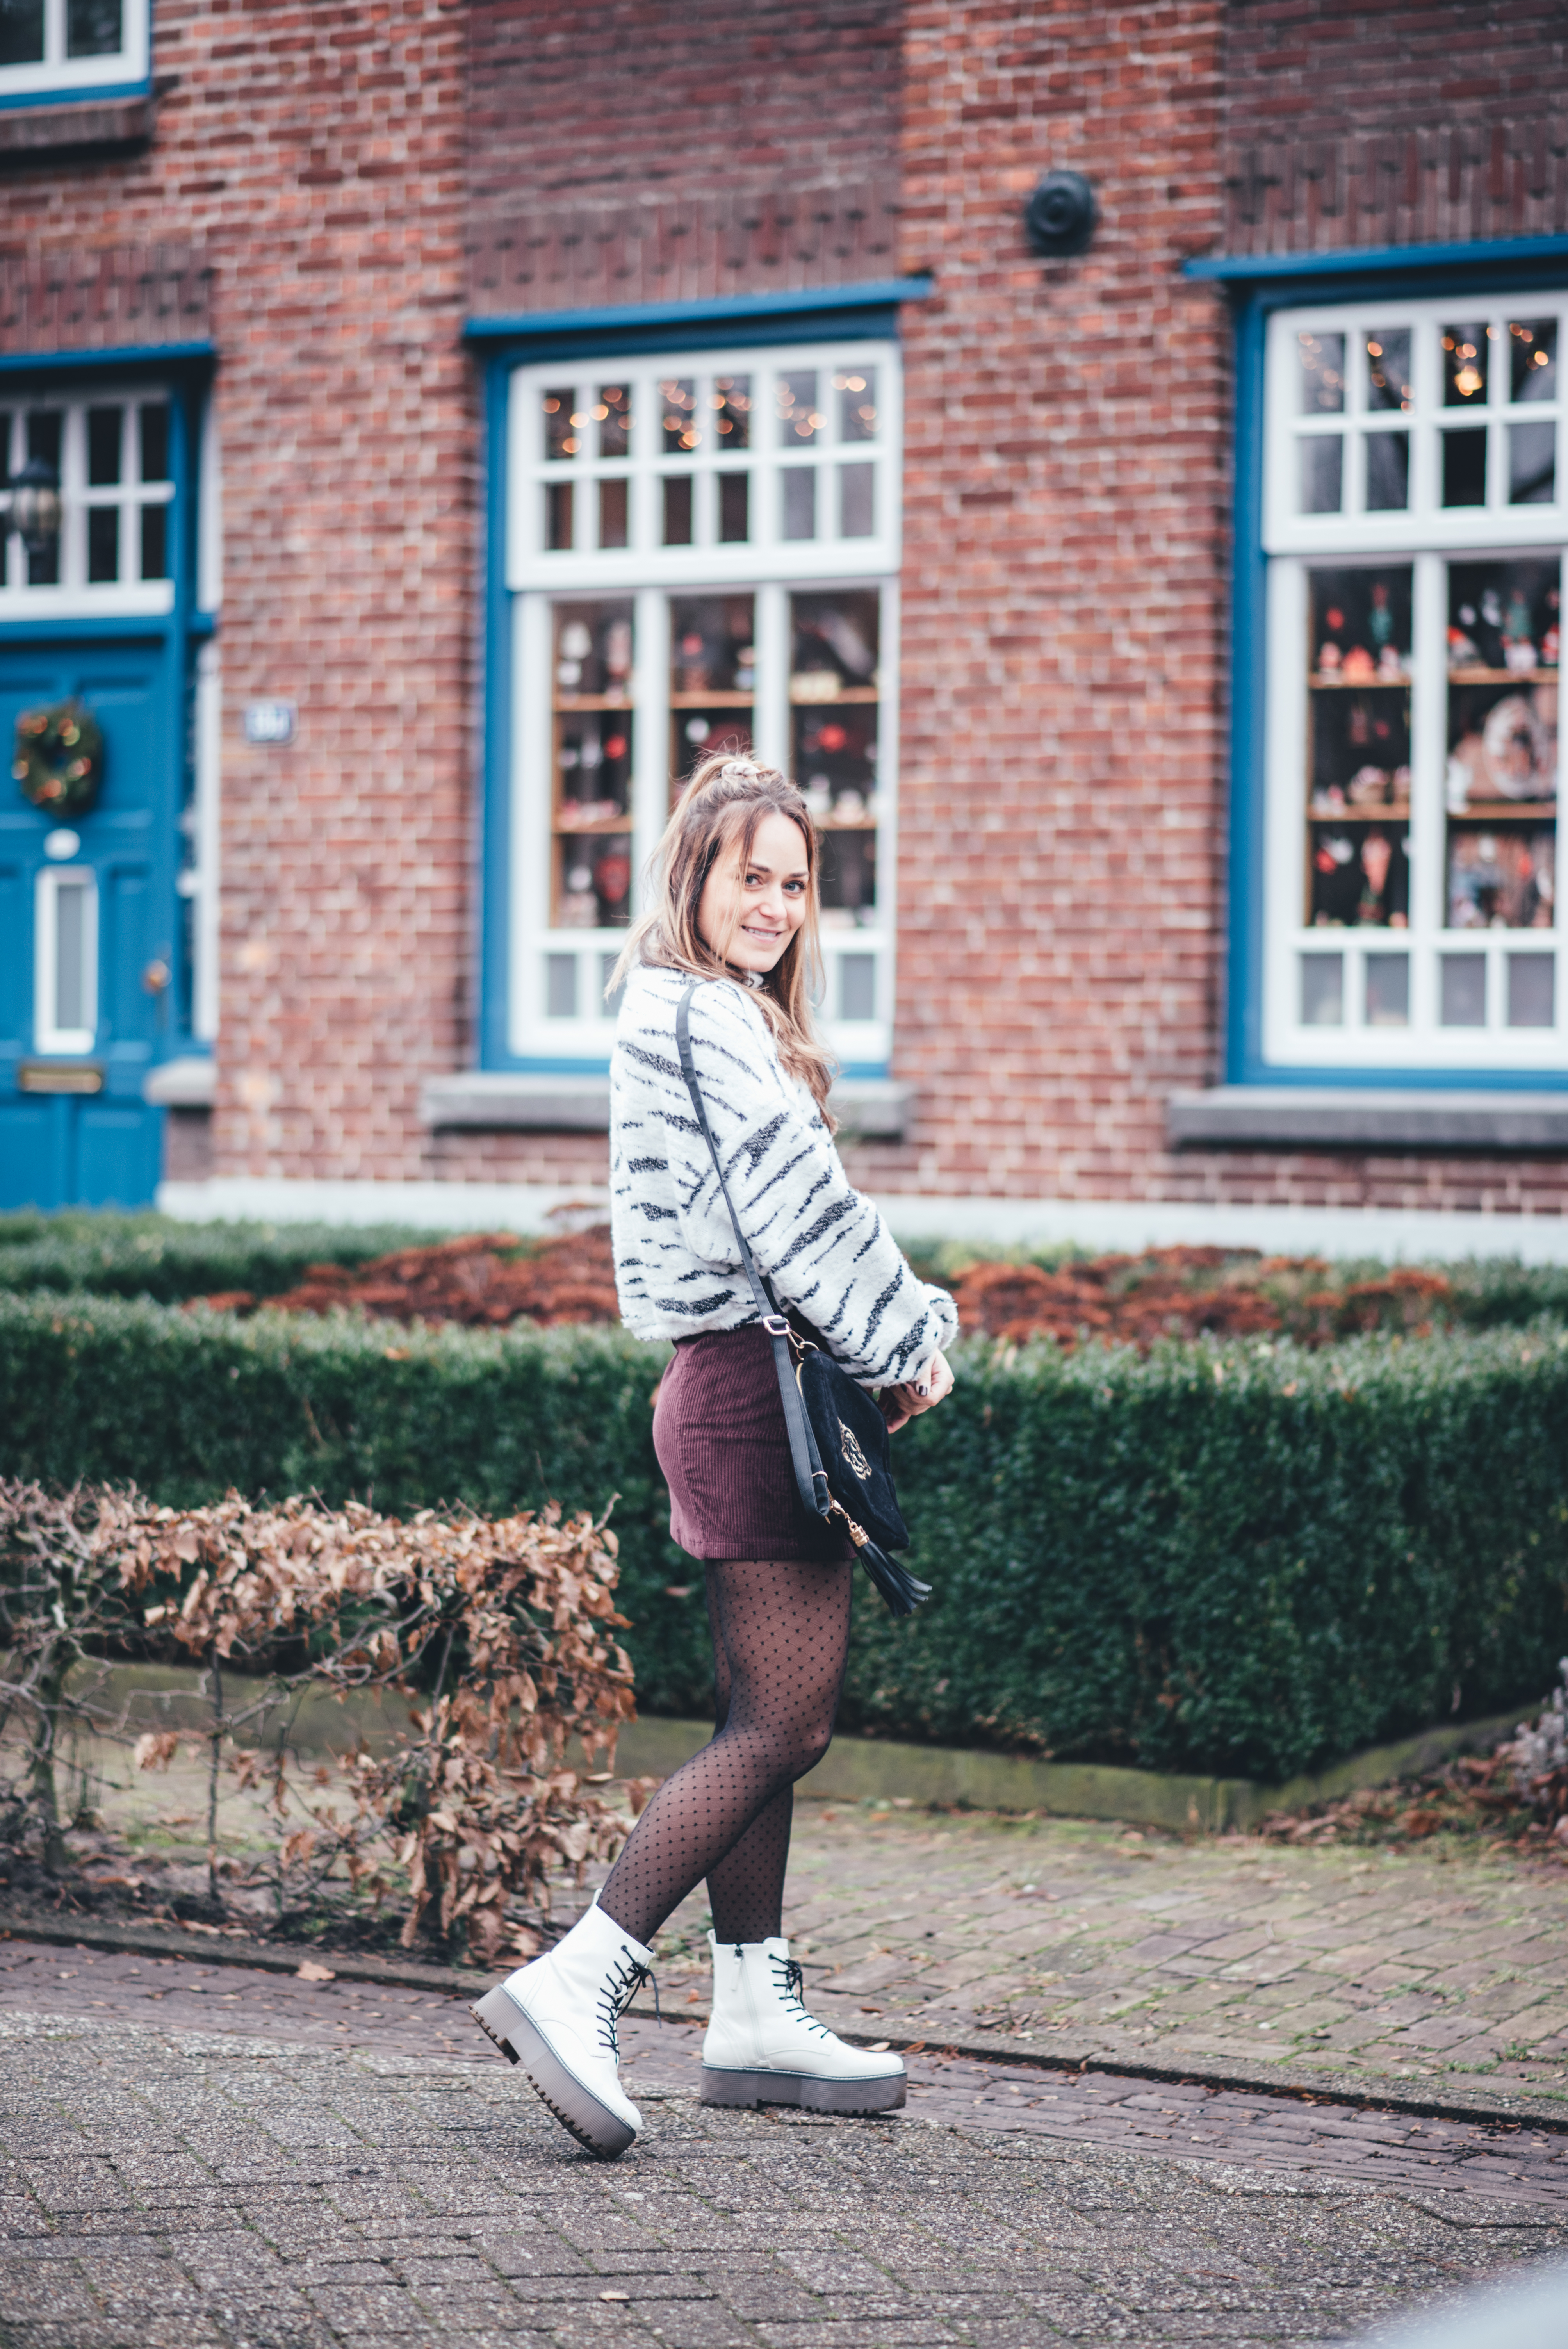 xmariekie, blog, blogger, influencer, ootd, outfit, tasje, fannypack, bumbag, stipjespanty, stippen, velvet, bulubrands, bulubrand, bulubags, model, inspiratie